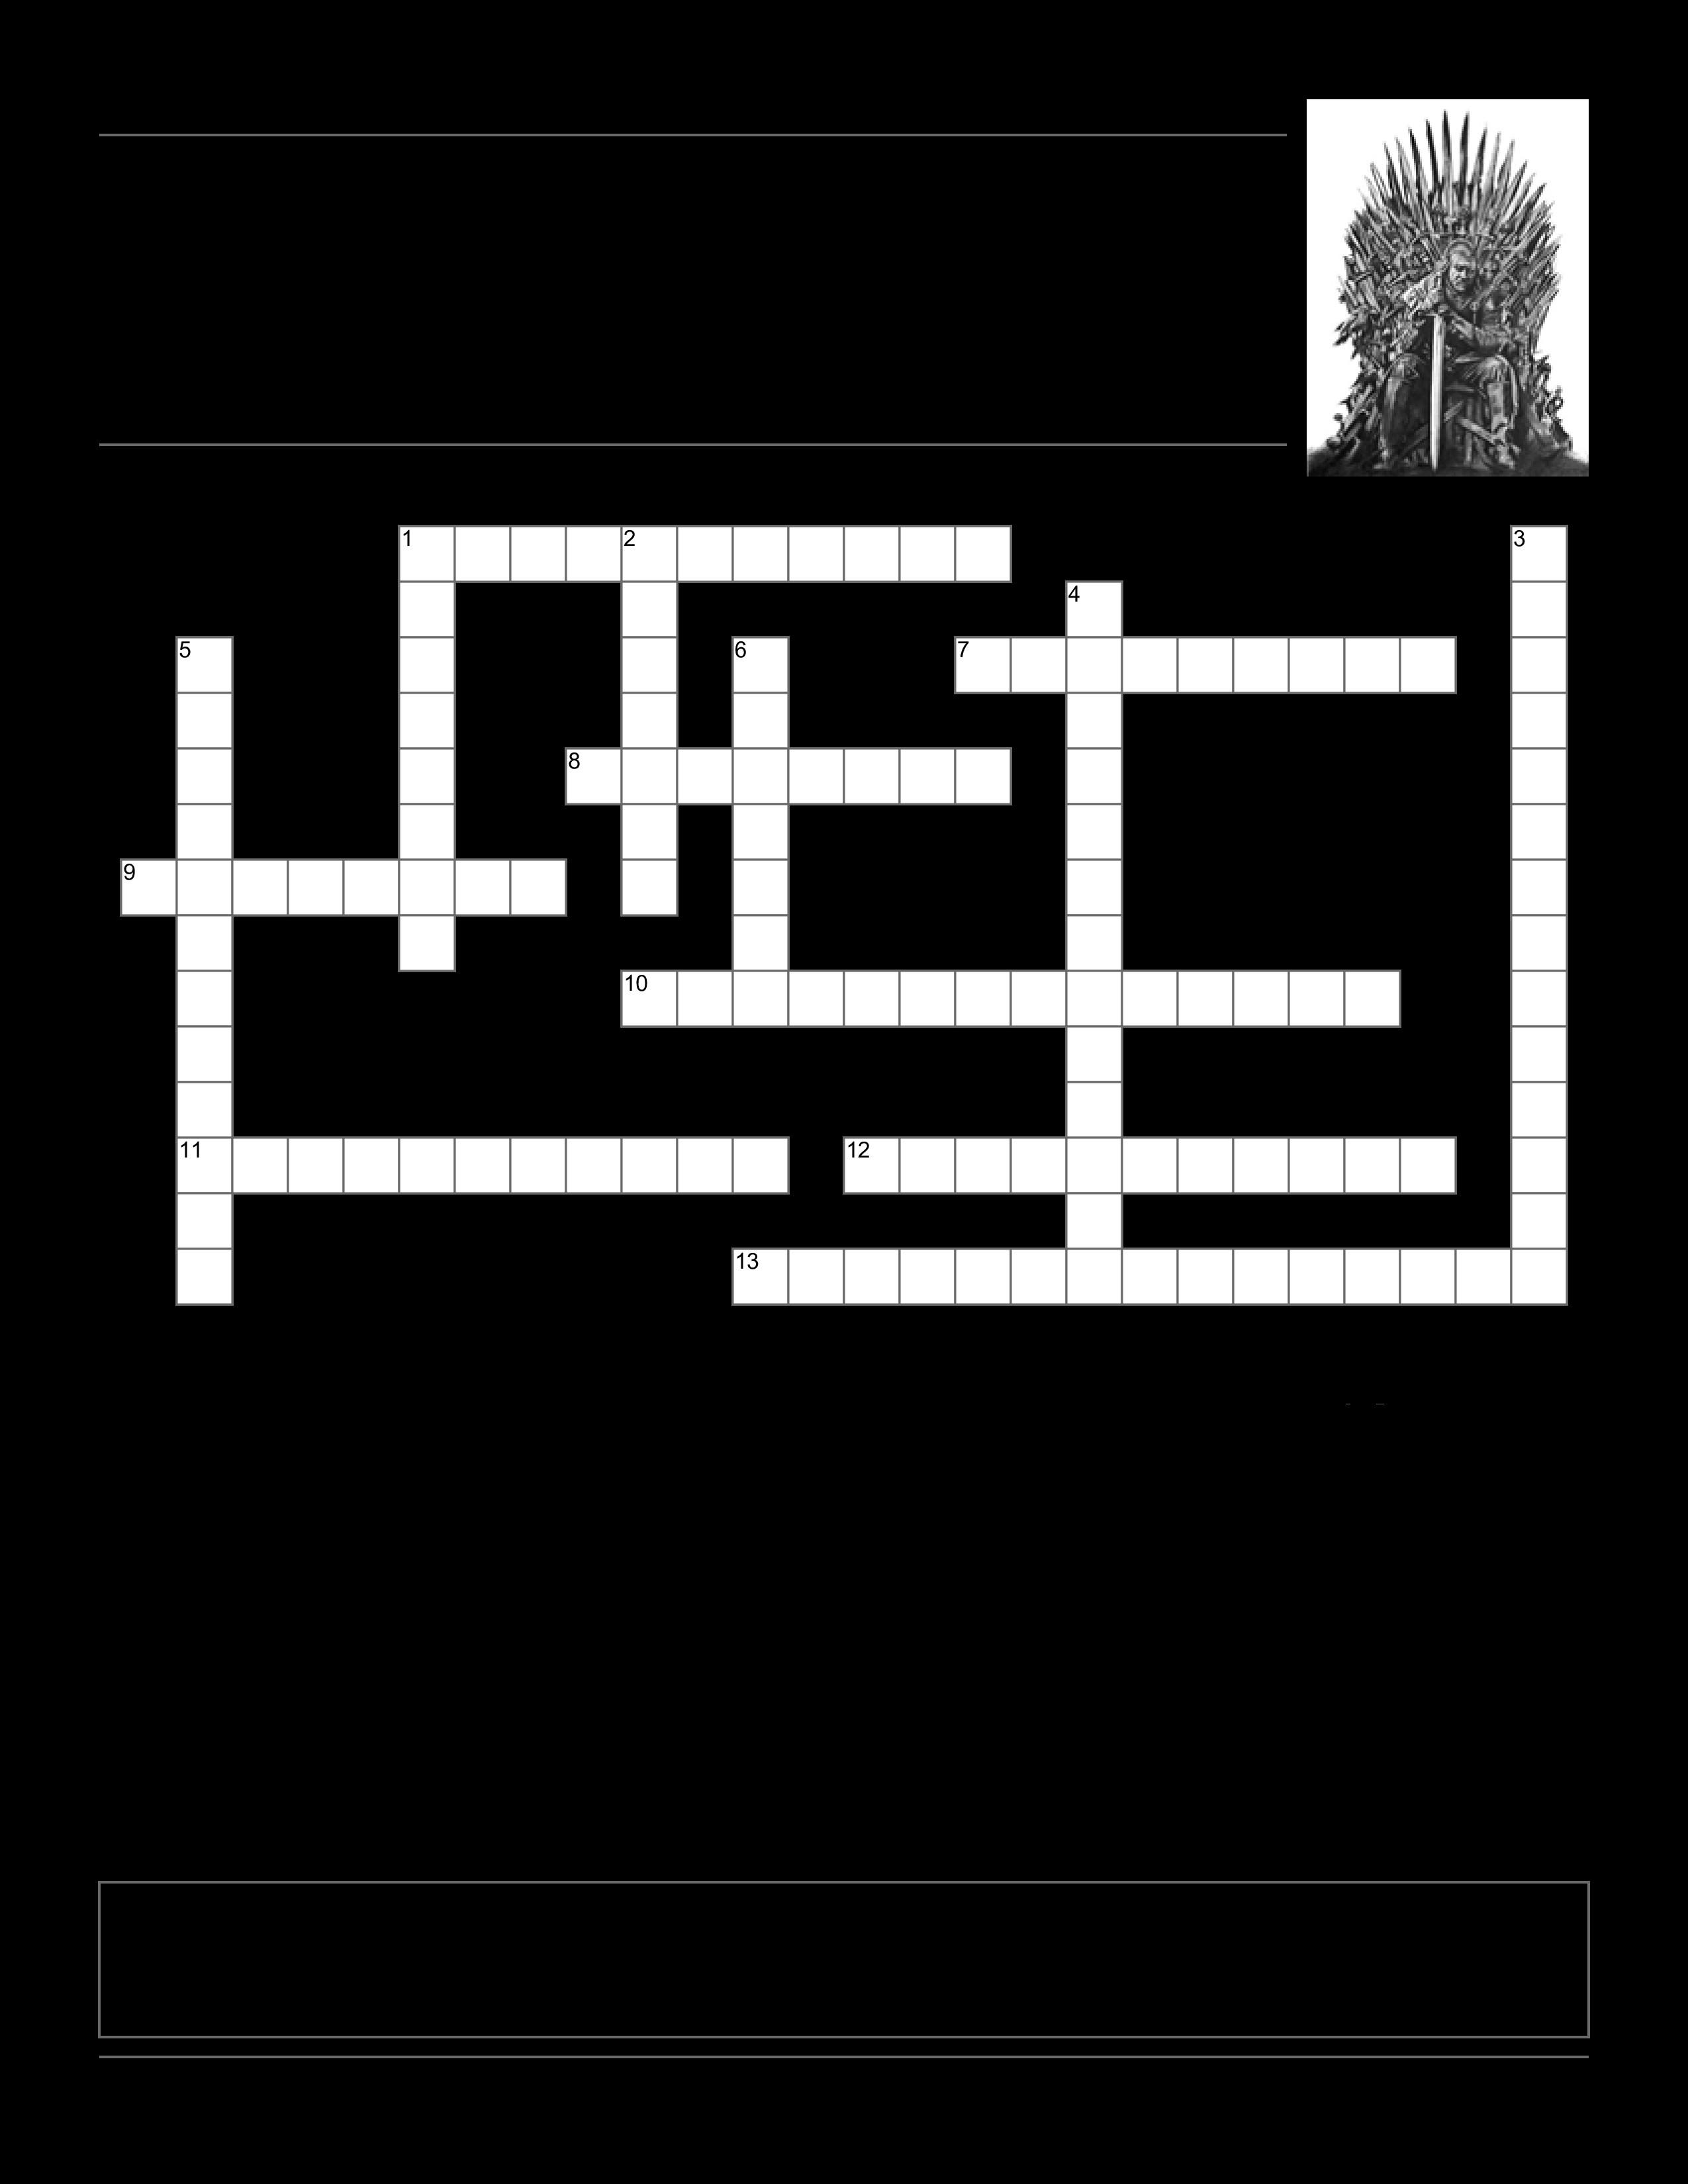 Game Of Thrones Menu Template Game Thrones Crossword